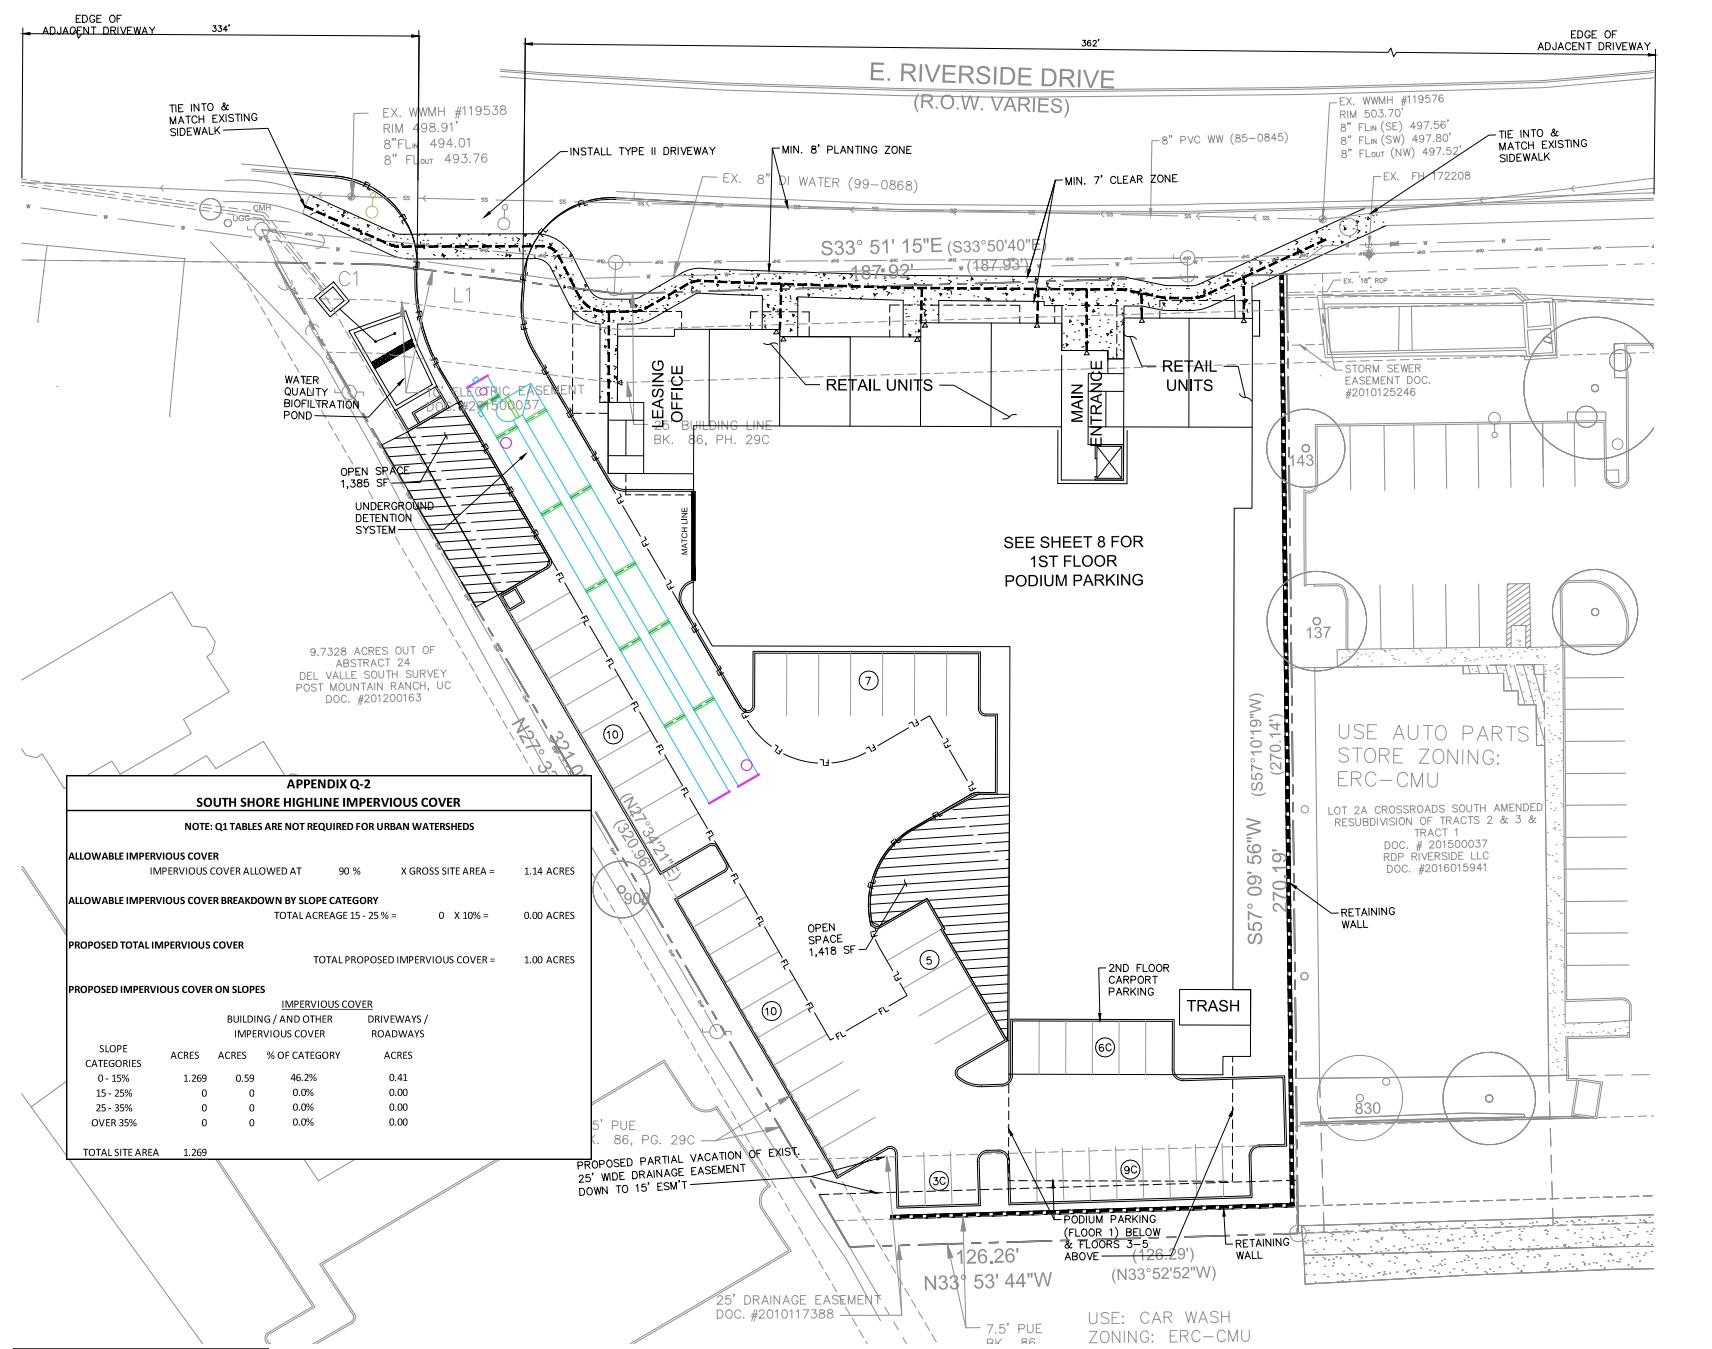 1712x1349 South Shore Highline Development Is East Riverside's New Normal